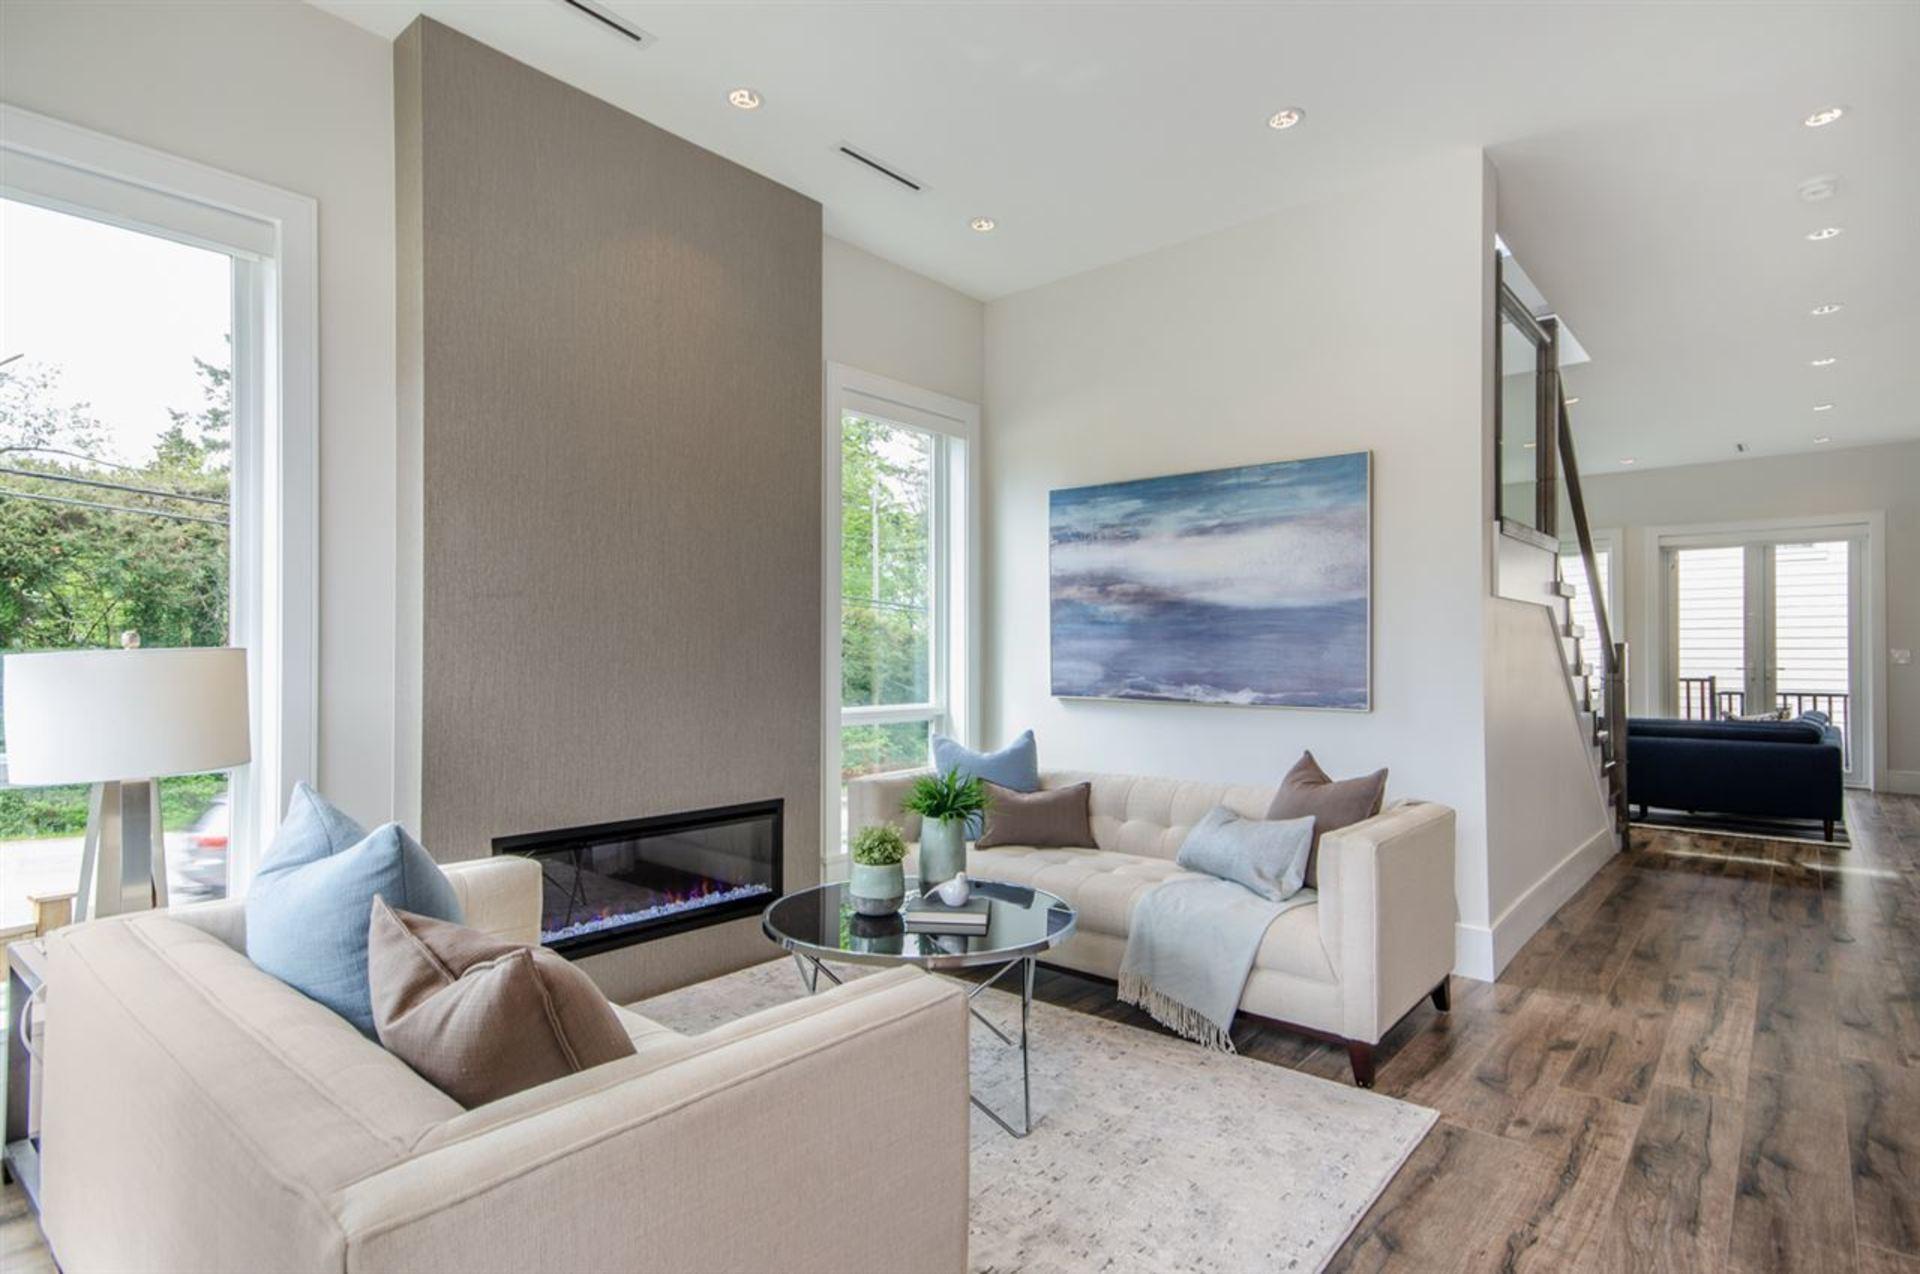 16025-28-avenue-grandview-surrey-south-surrey-white-rock-03 at 16025 28 Avenue, Grandview Surrey, South Surrey White Rock